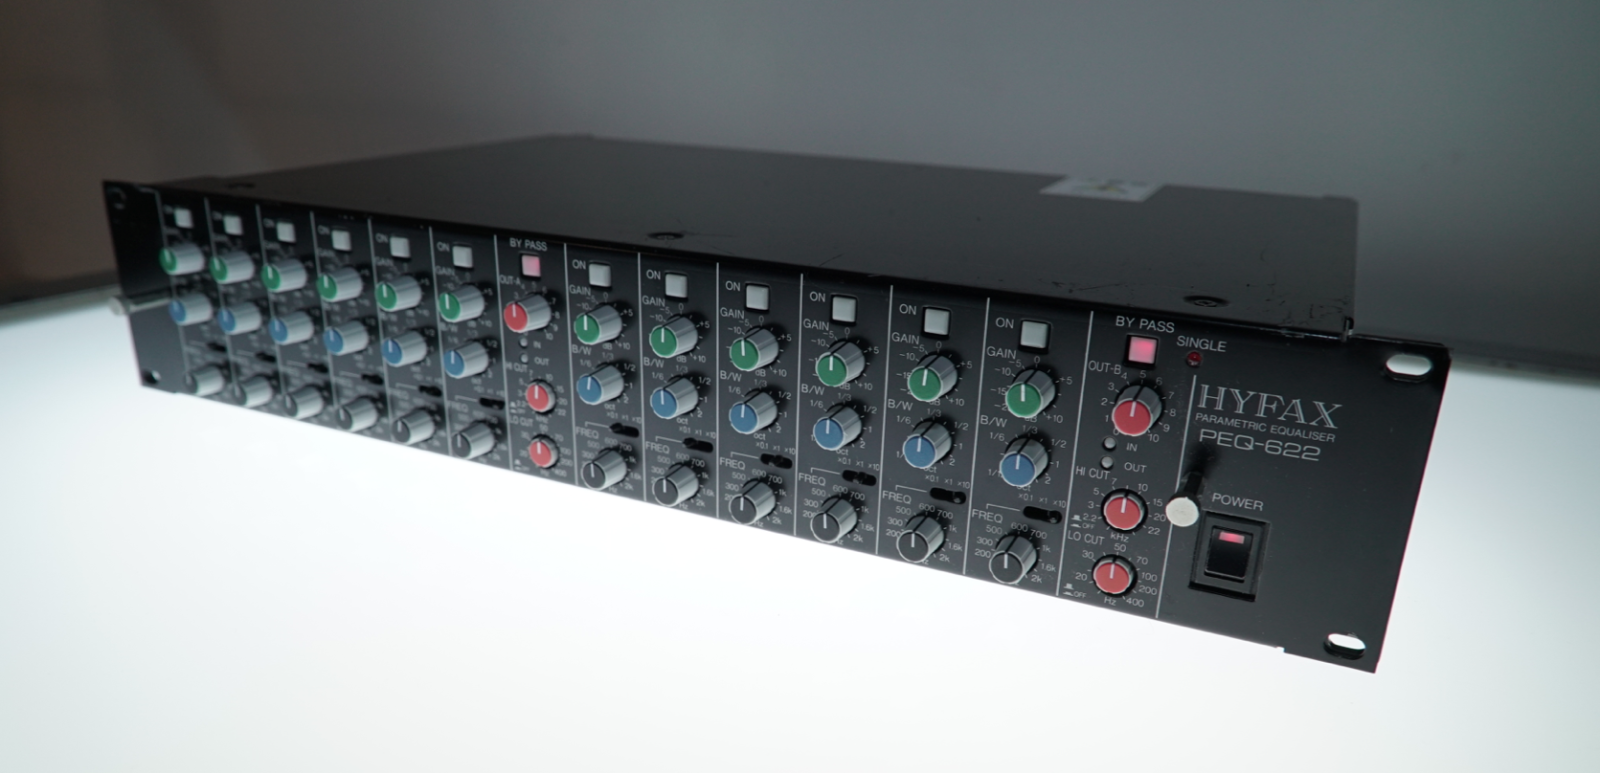 Hyfax PEQ 622 Stereo Parametric Equalizer